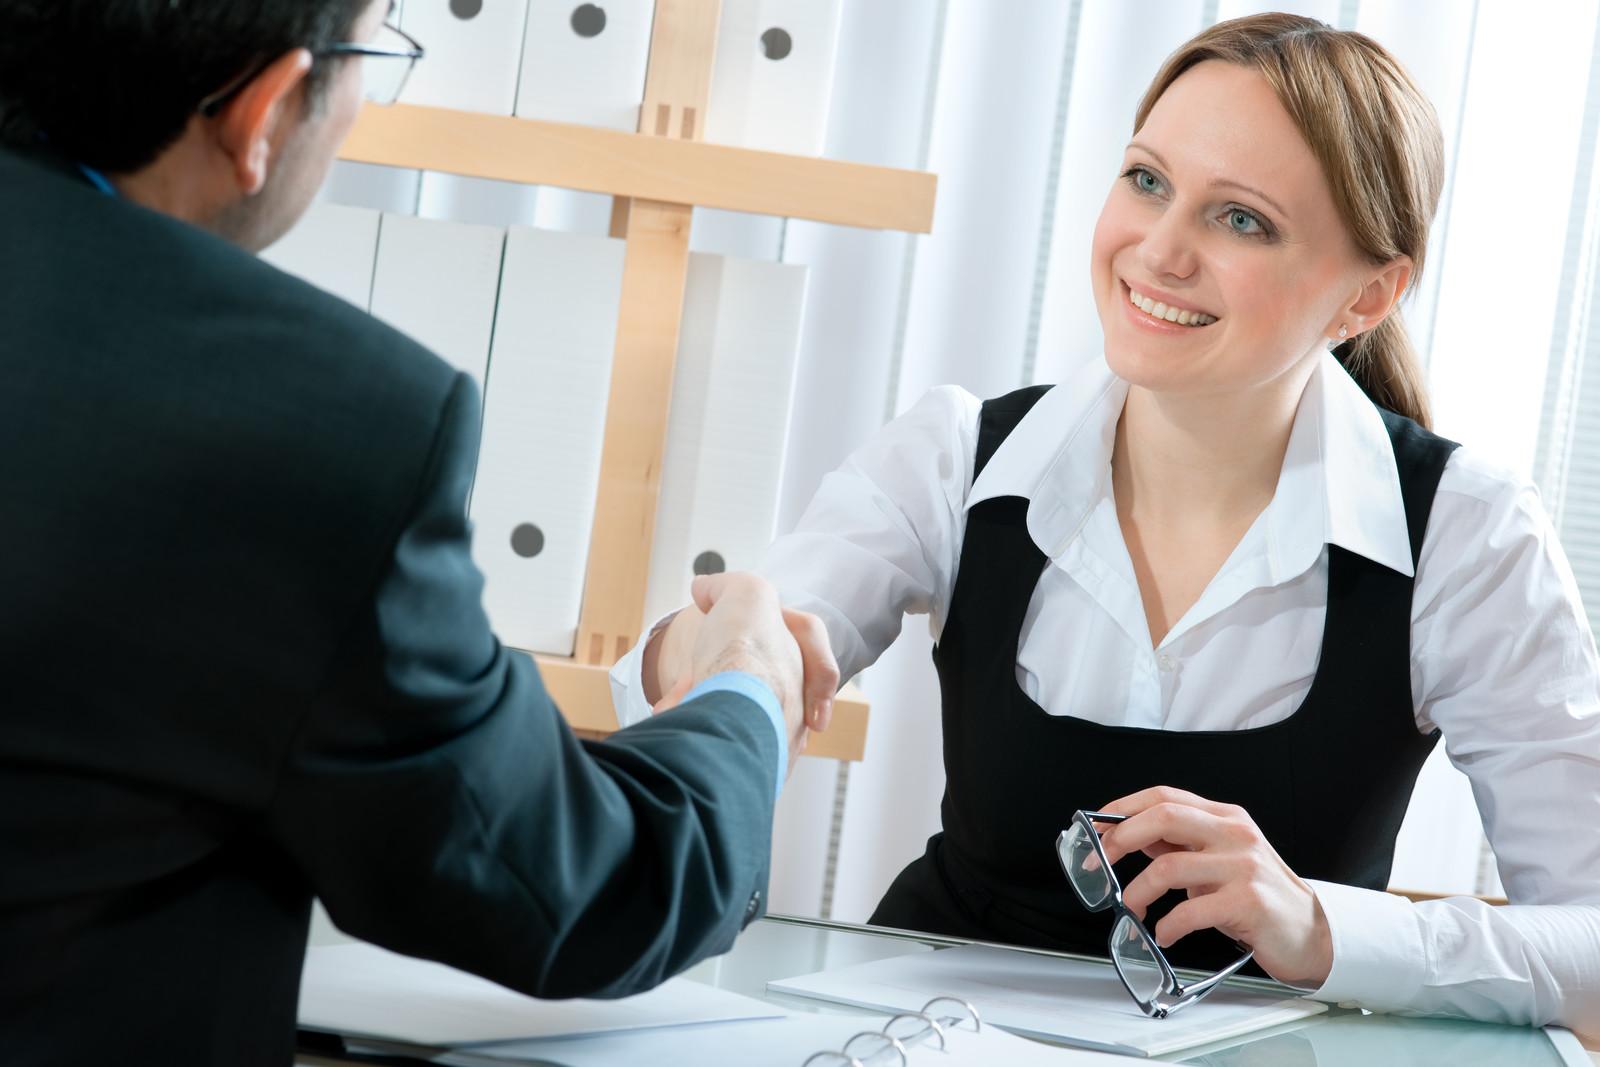 interviewing for success workshop hellmann career consulting interviewing for success workshop